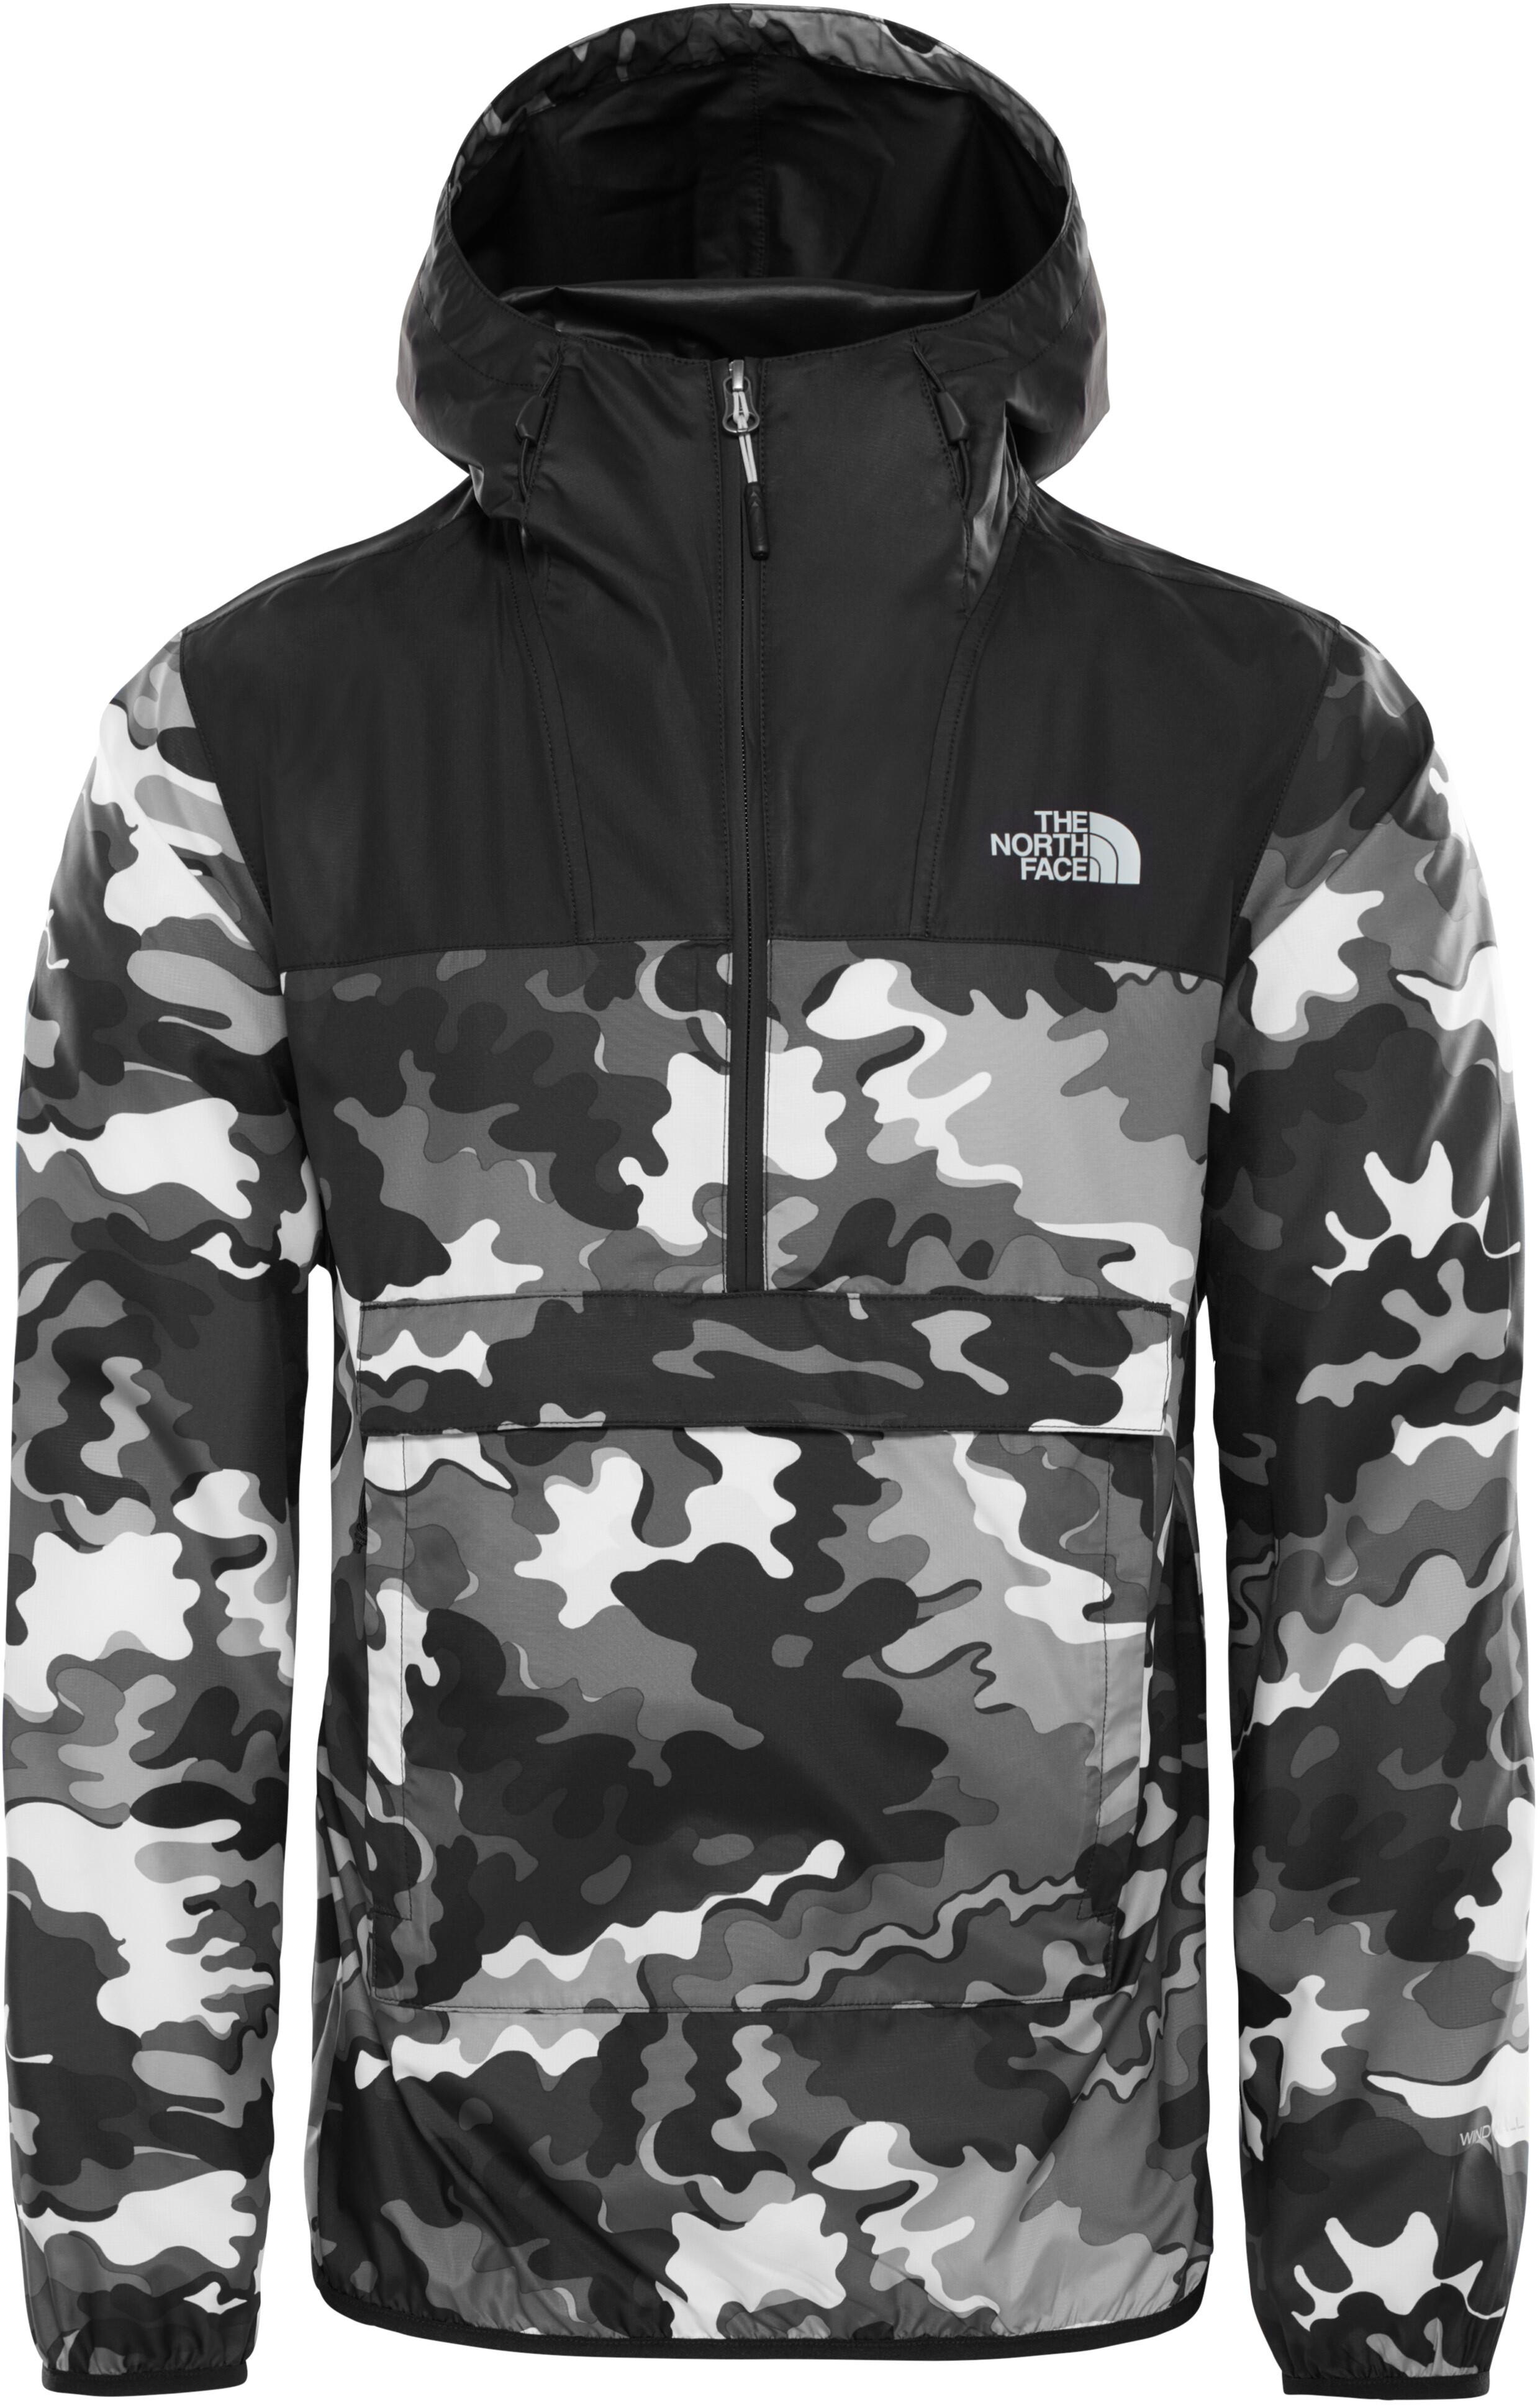 d82349513 The North Face Novelty Fanorak Jacket Men, tnf black psychdelic print/tnf  black